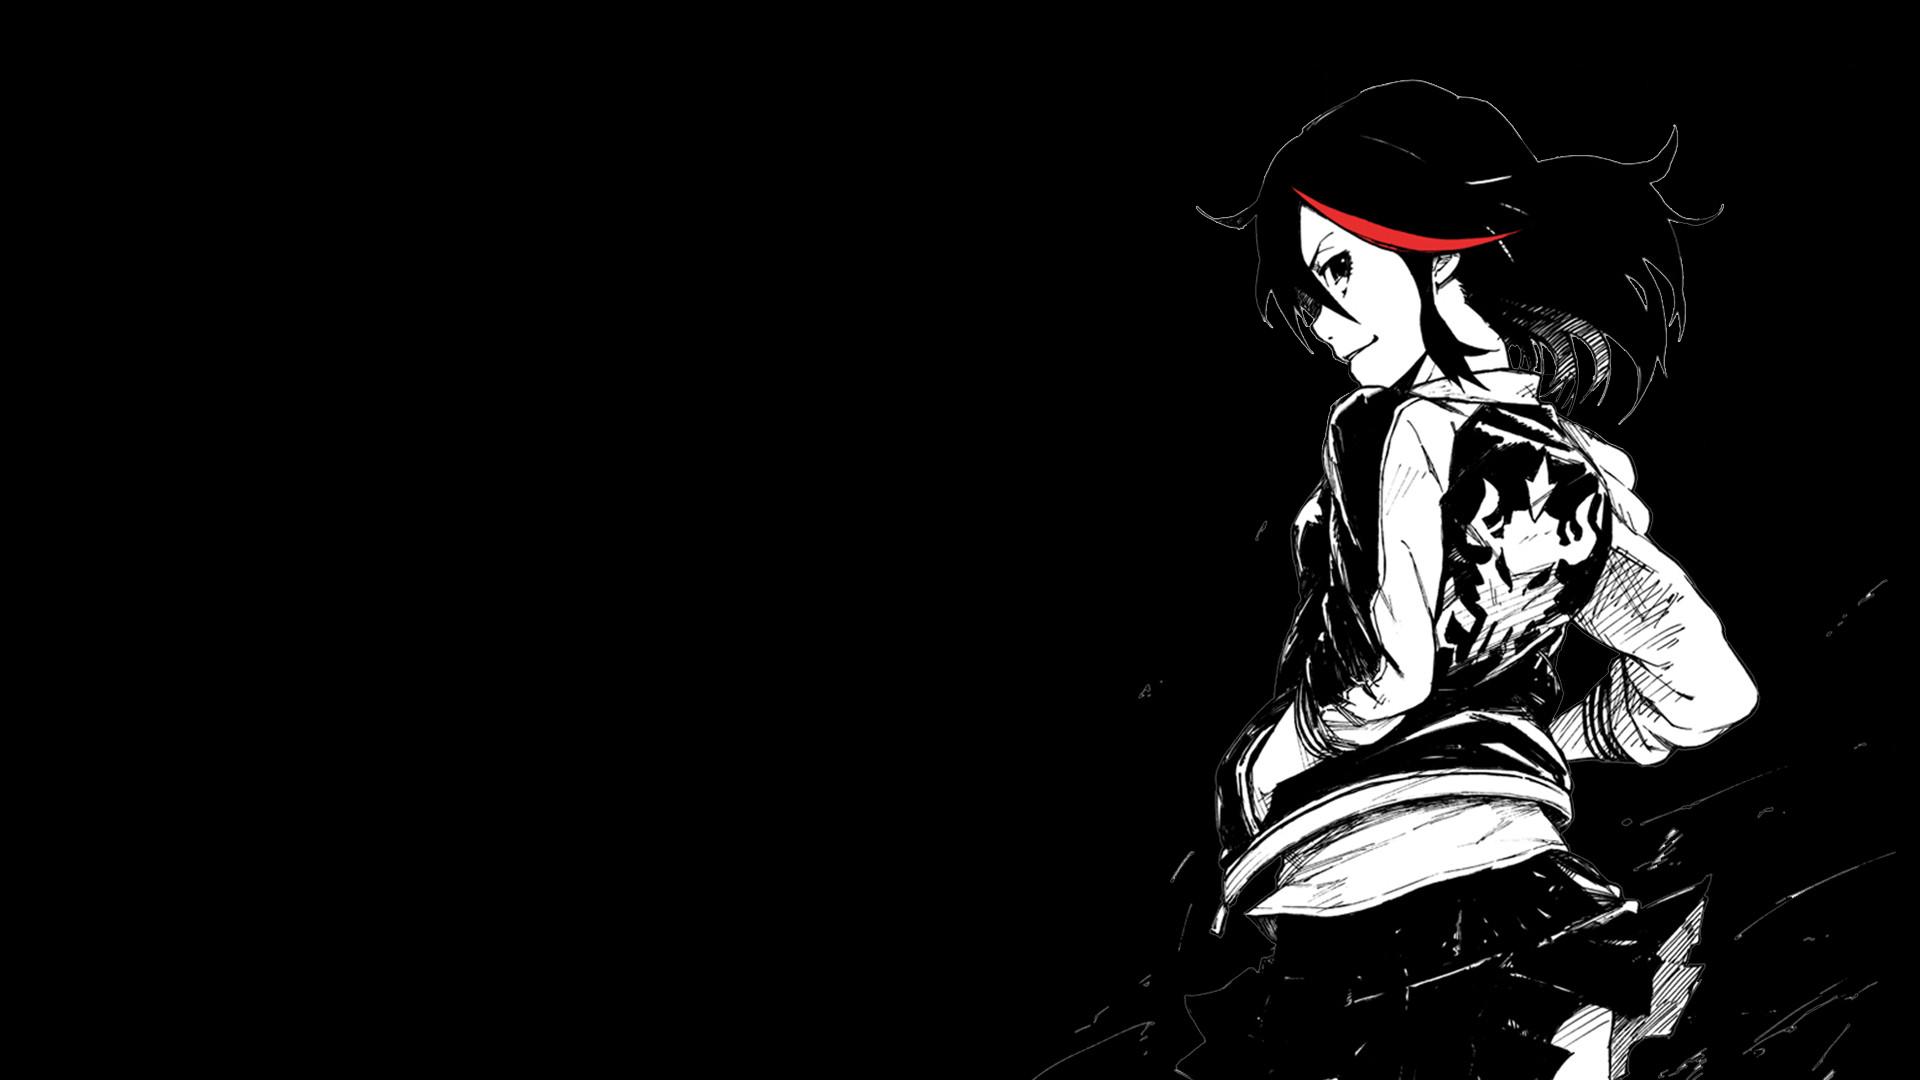 Kill La Kill Full HD Wallpaper and Background Image ...